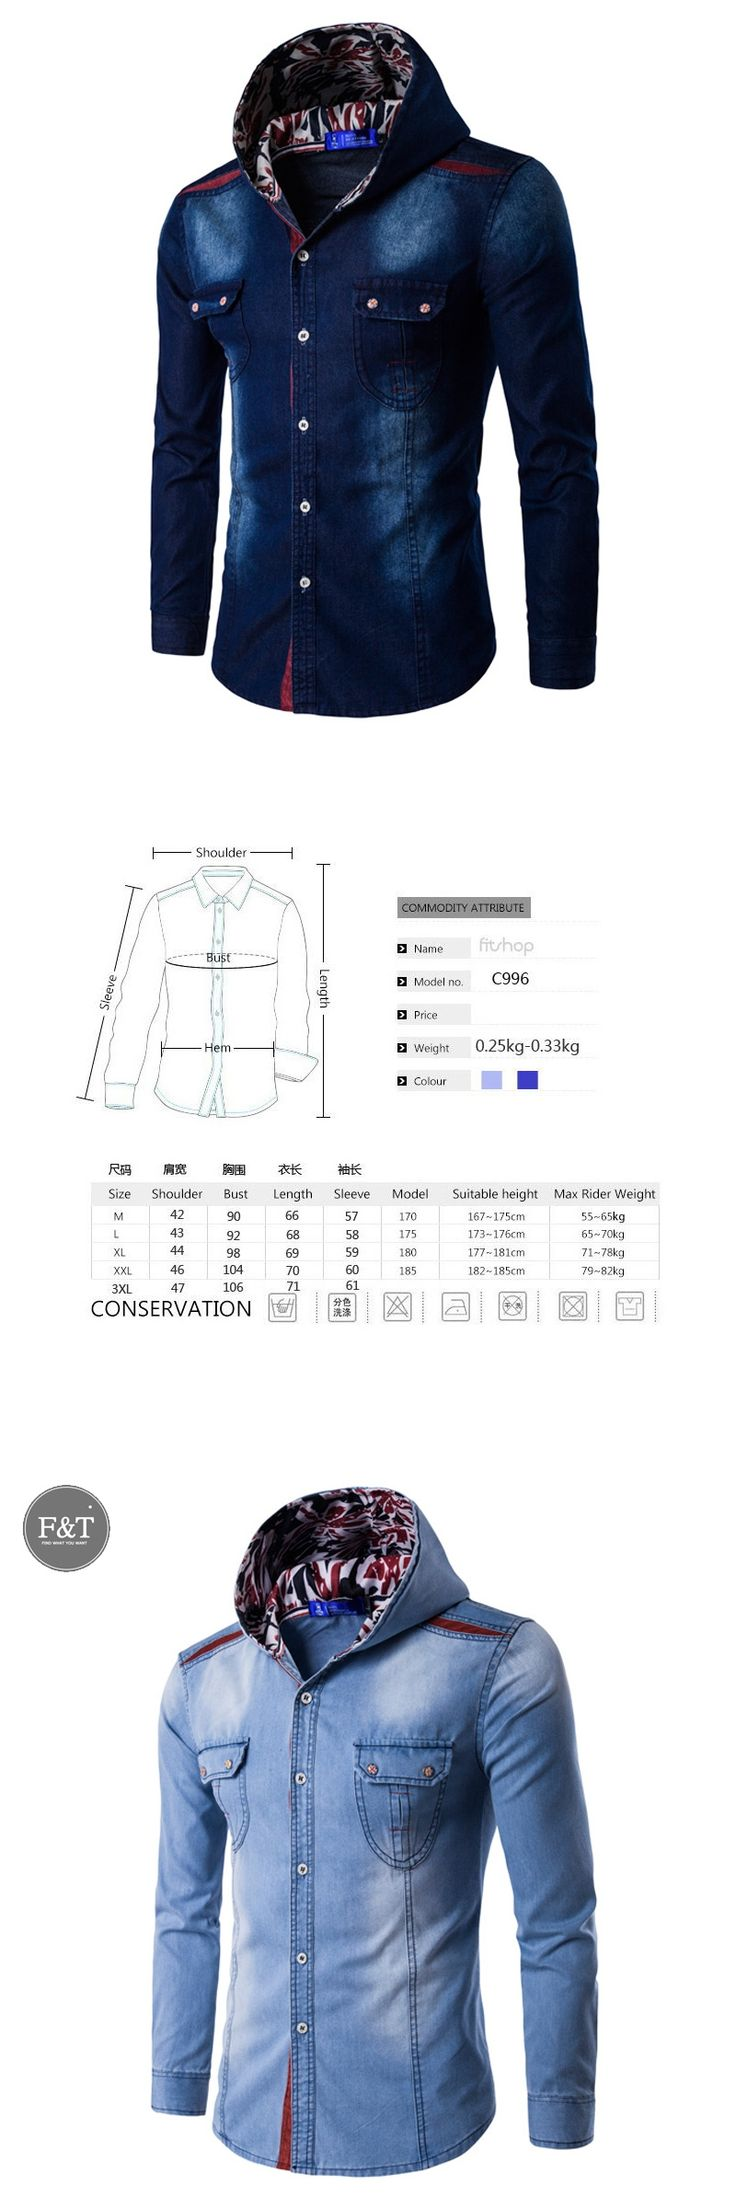 [Asian Size] 2016 Large Size Denim Shirt Men Cotton Brand Clothing Jeans Camisa Social Masculina Long Sleeve Blue Chemise Homme